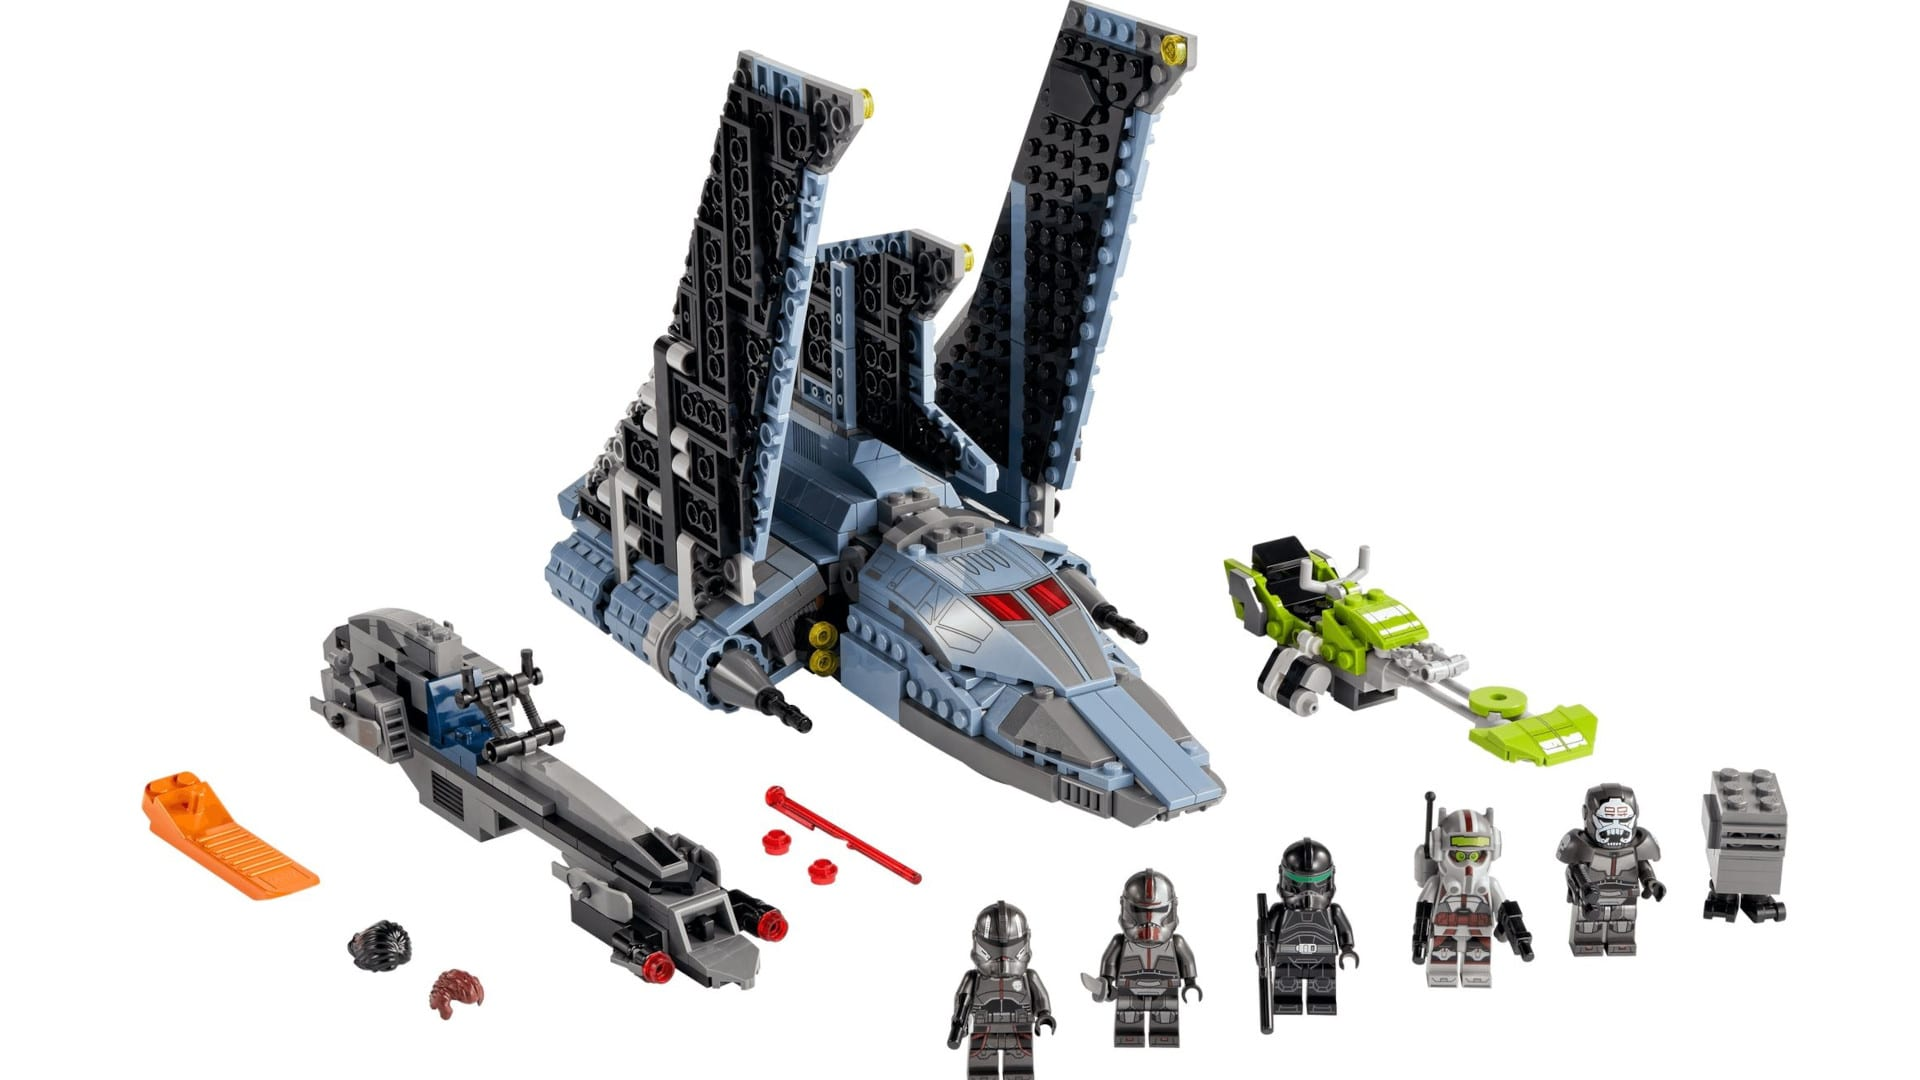 LEGO Star Wars Angriffsshuttle